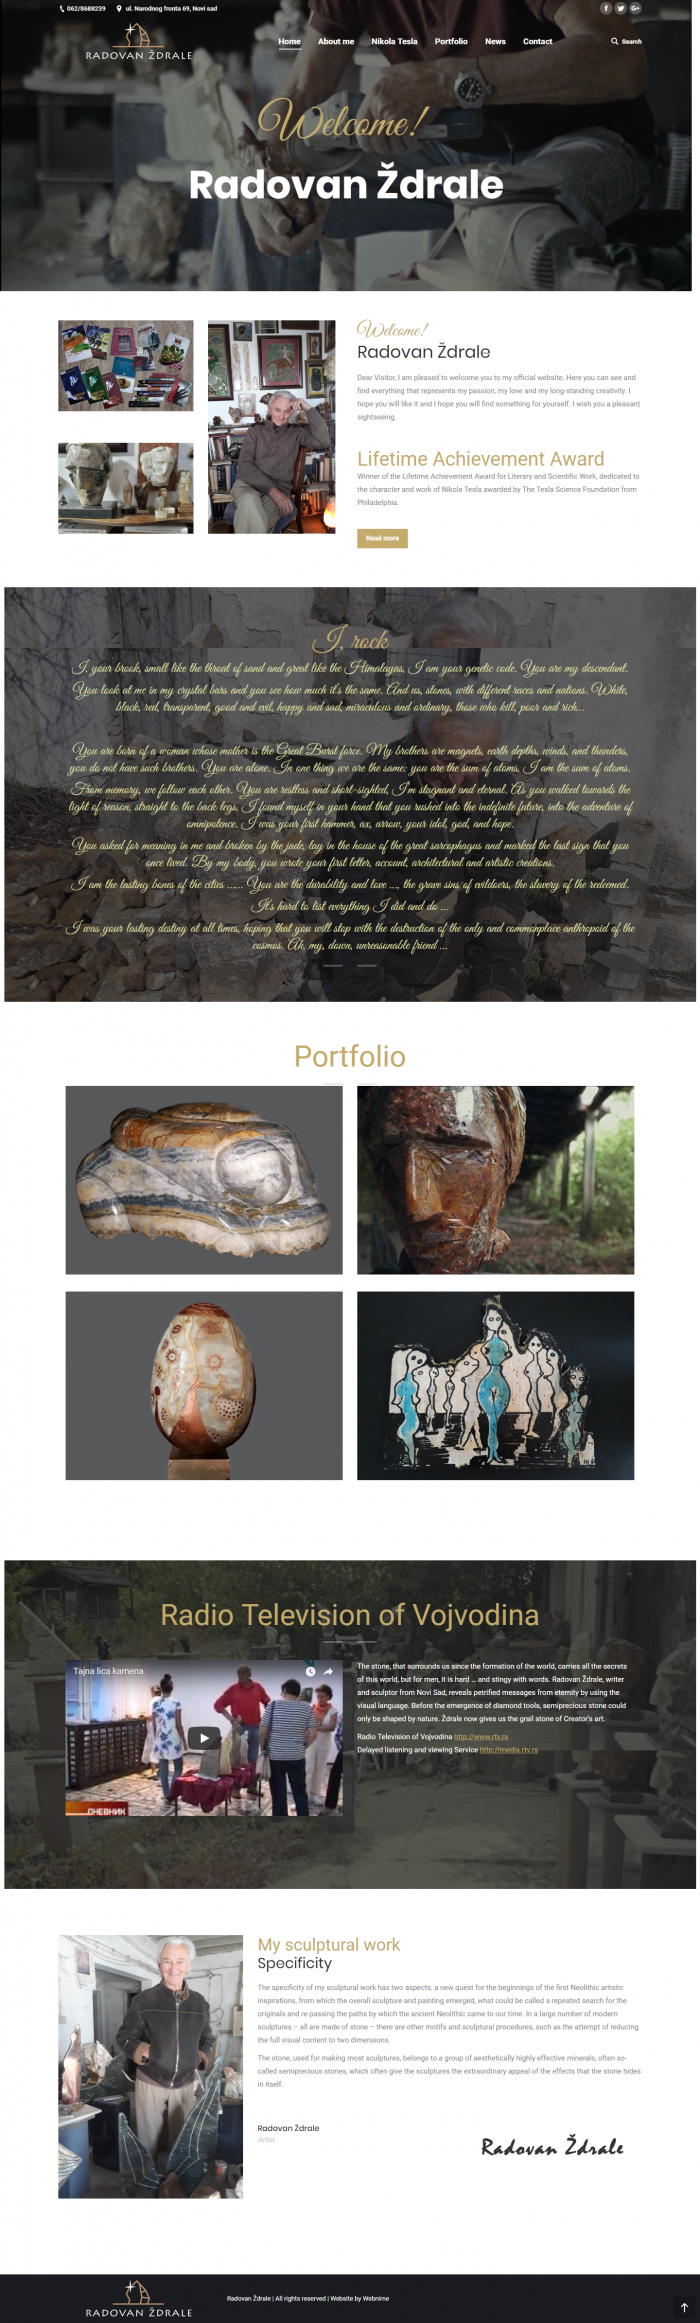 Изработка на сайт за Radovan Ždrale, https://webnime.com/